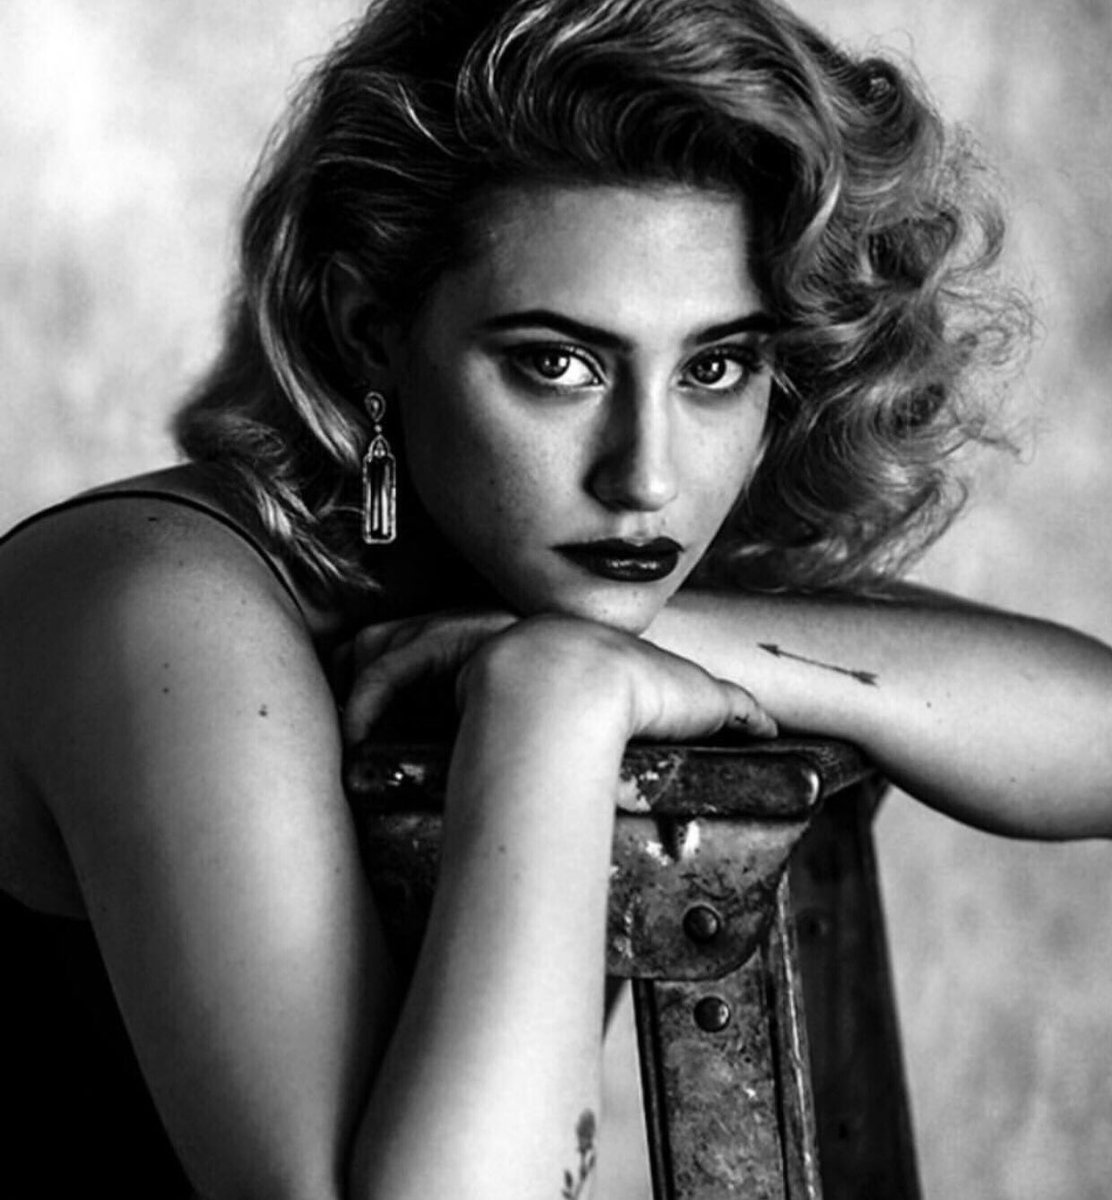 Lili-Reinhart-Photoshoot-By-Damon-Baker-December-2018-lili-reinhart-41761717-1112-1200.jpg